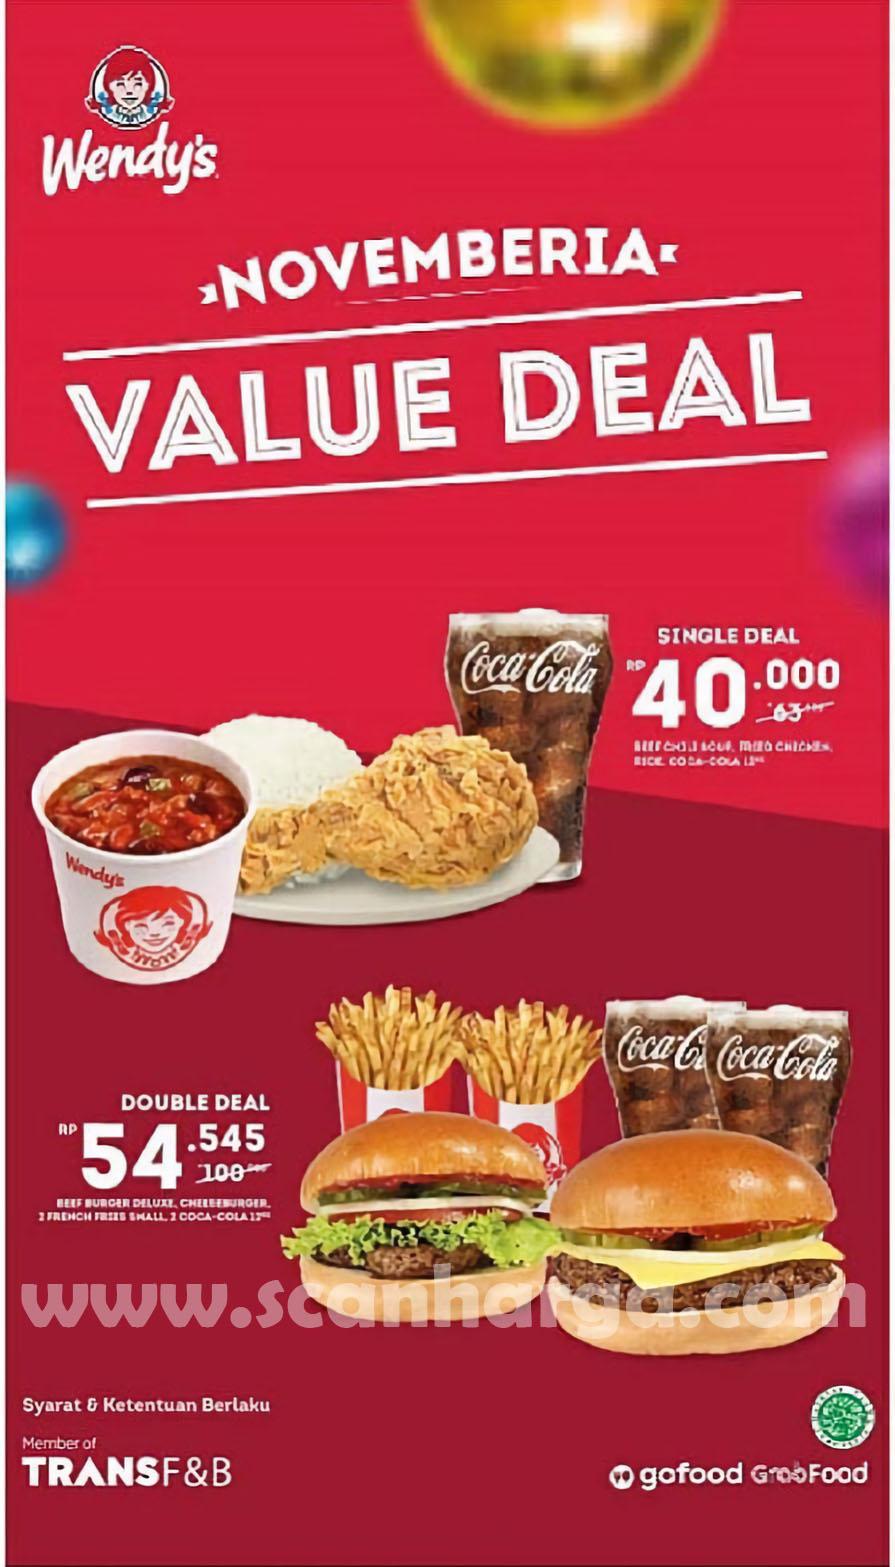 Promo Wendy's Novemberia Paket Value Deal